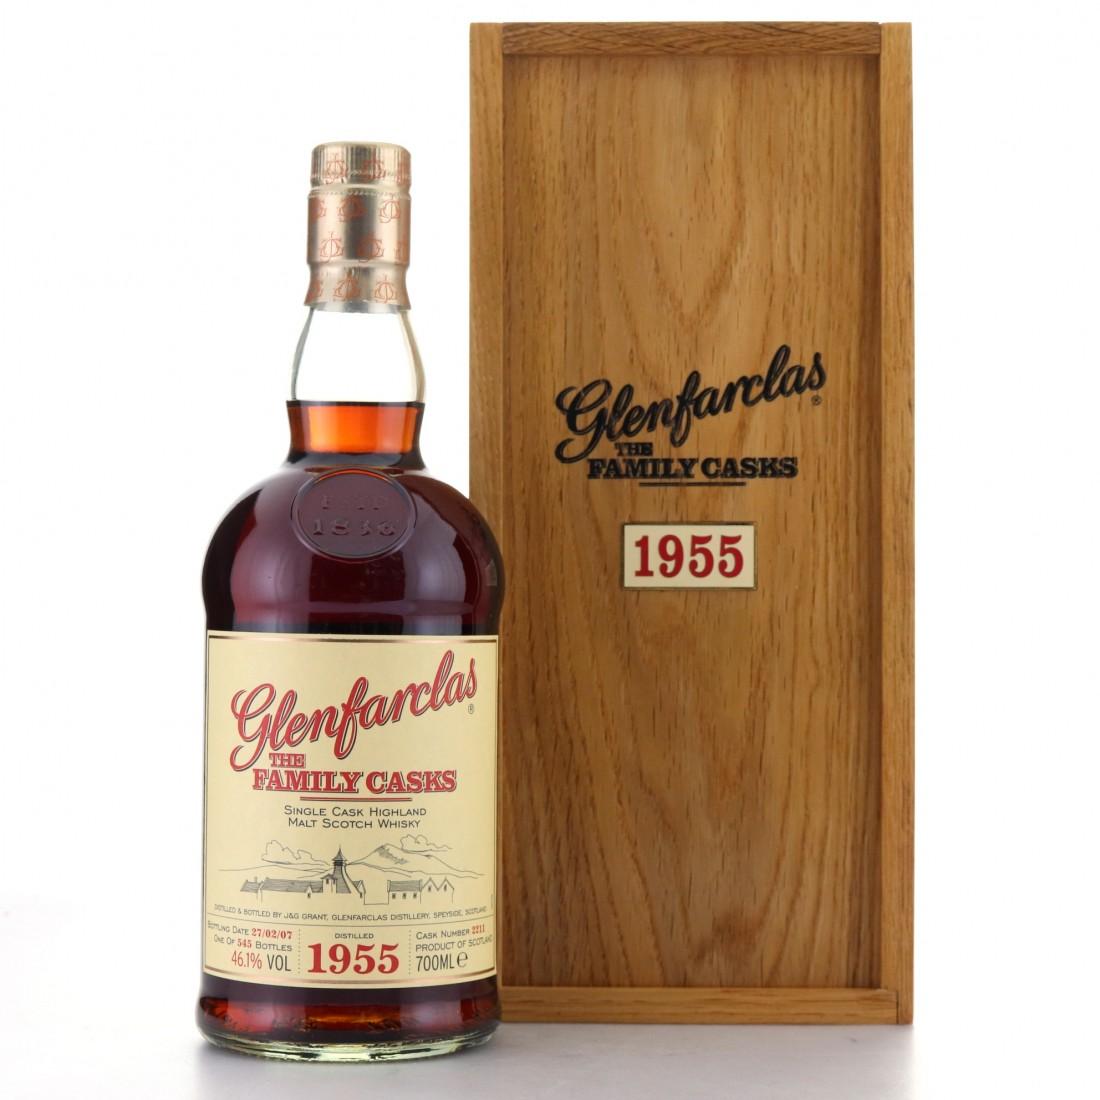 Glenfarclas 1955 Family Cask #2211